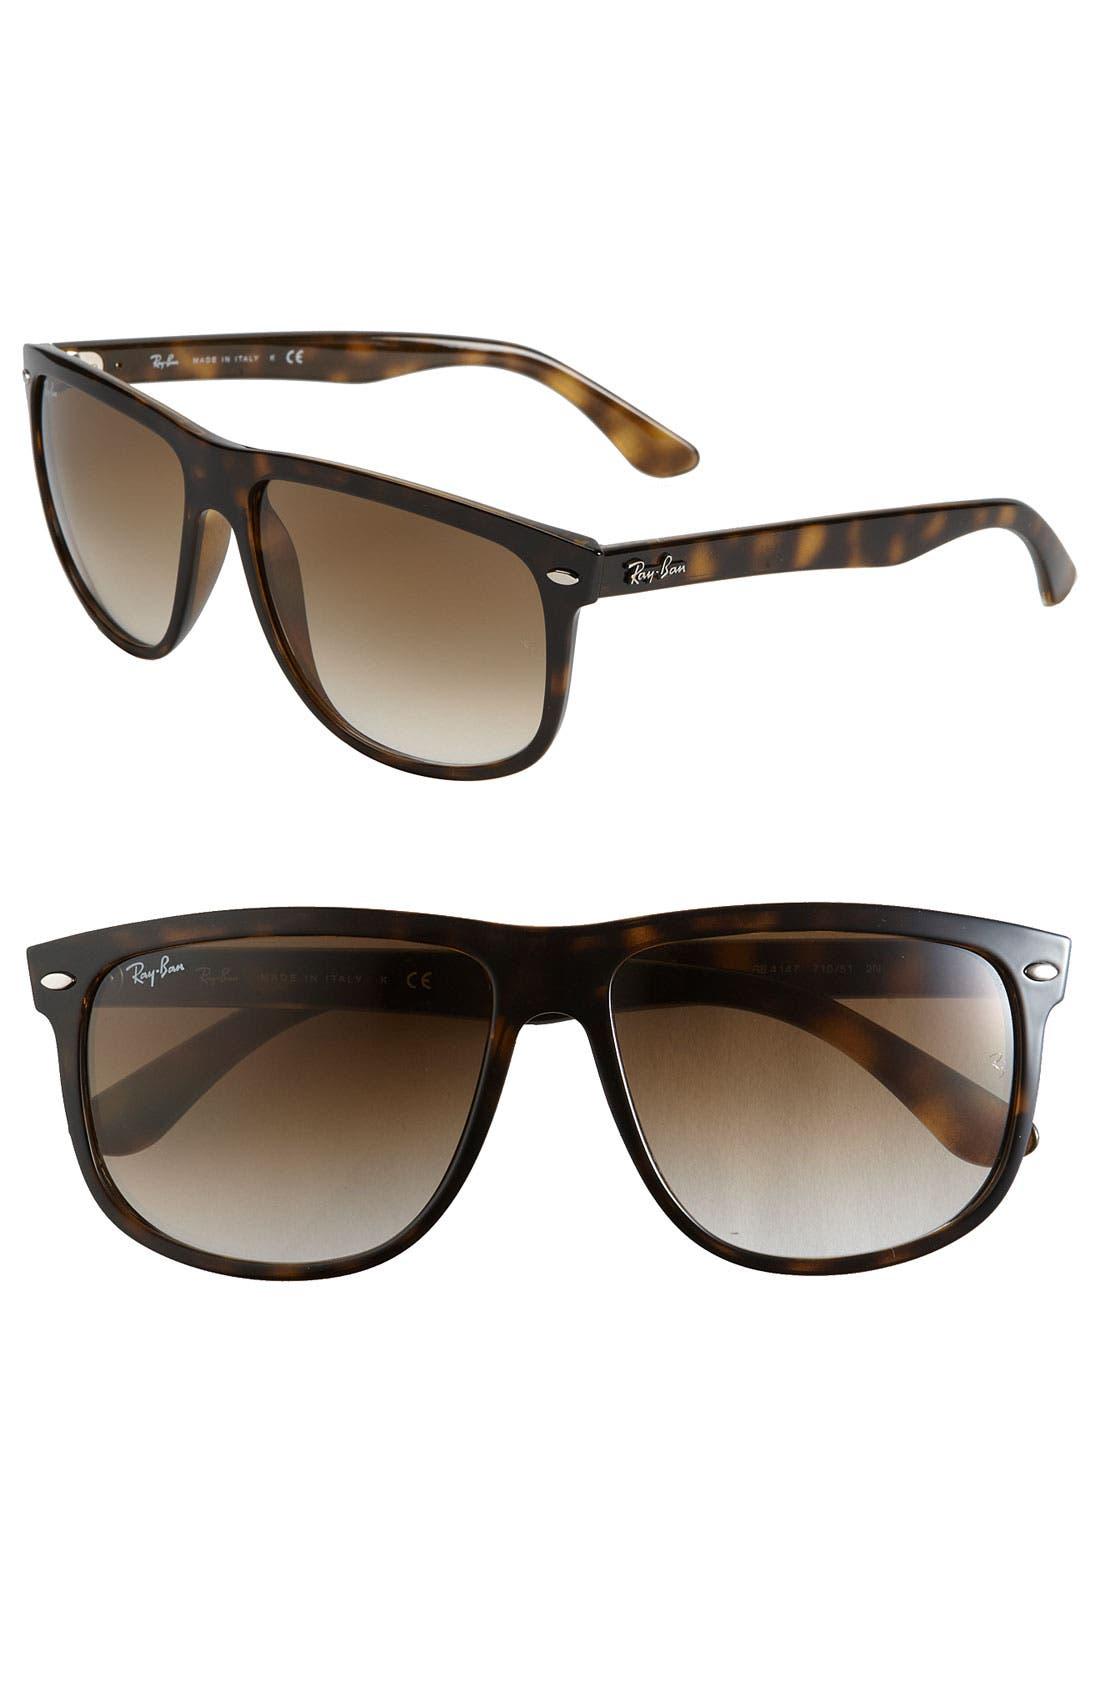 Ray-Ban Boyfriend 60Mm Flat Top Sunglasses -